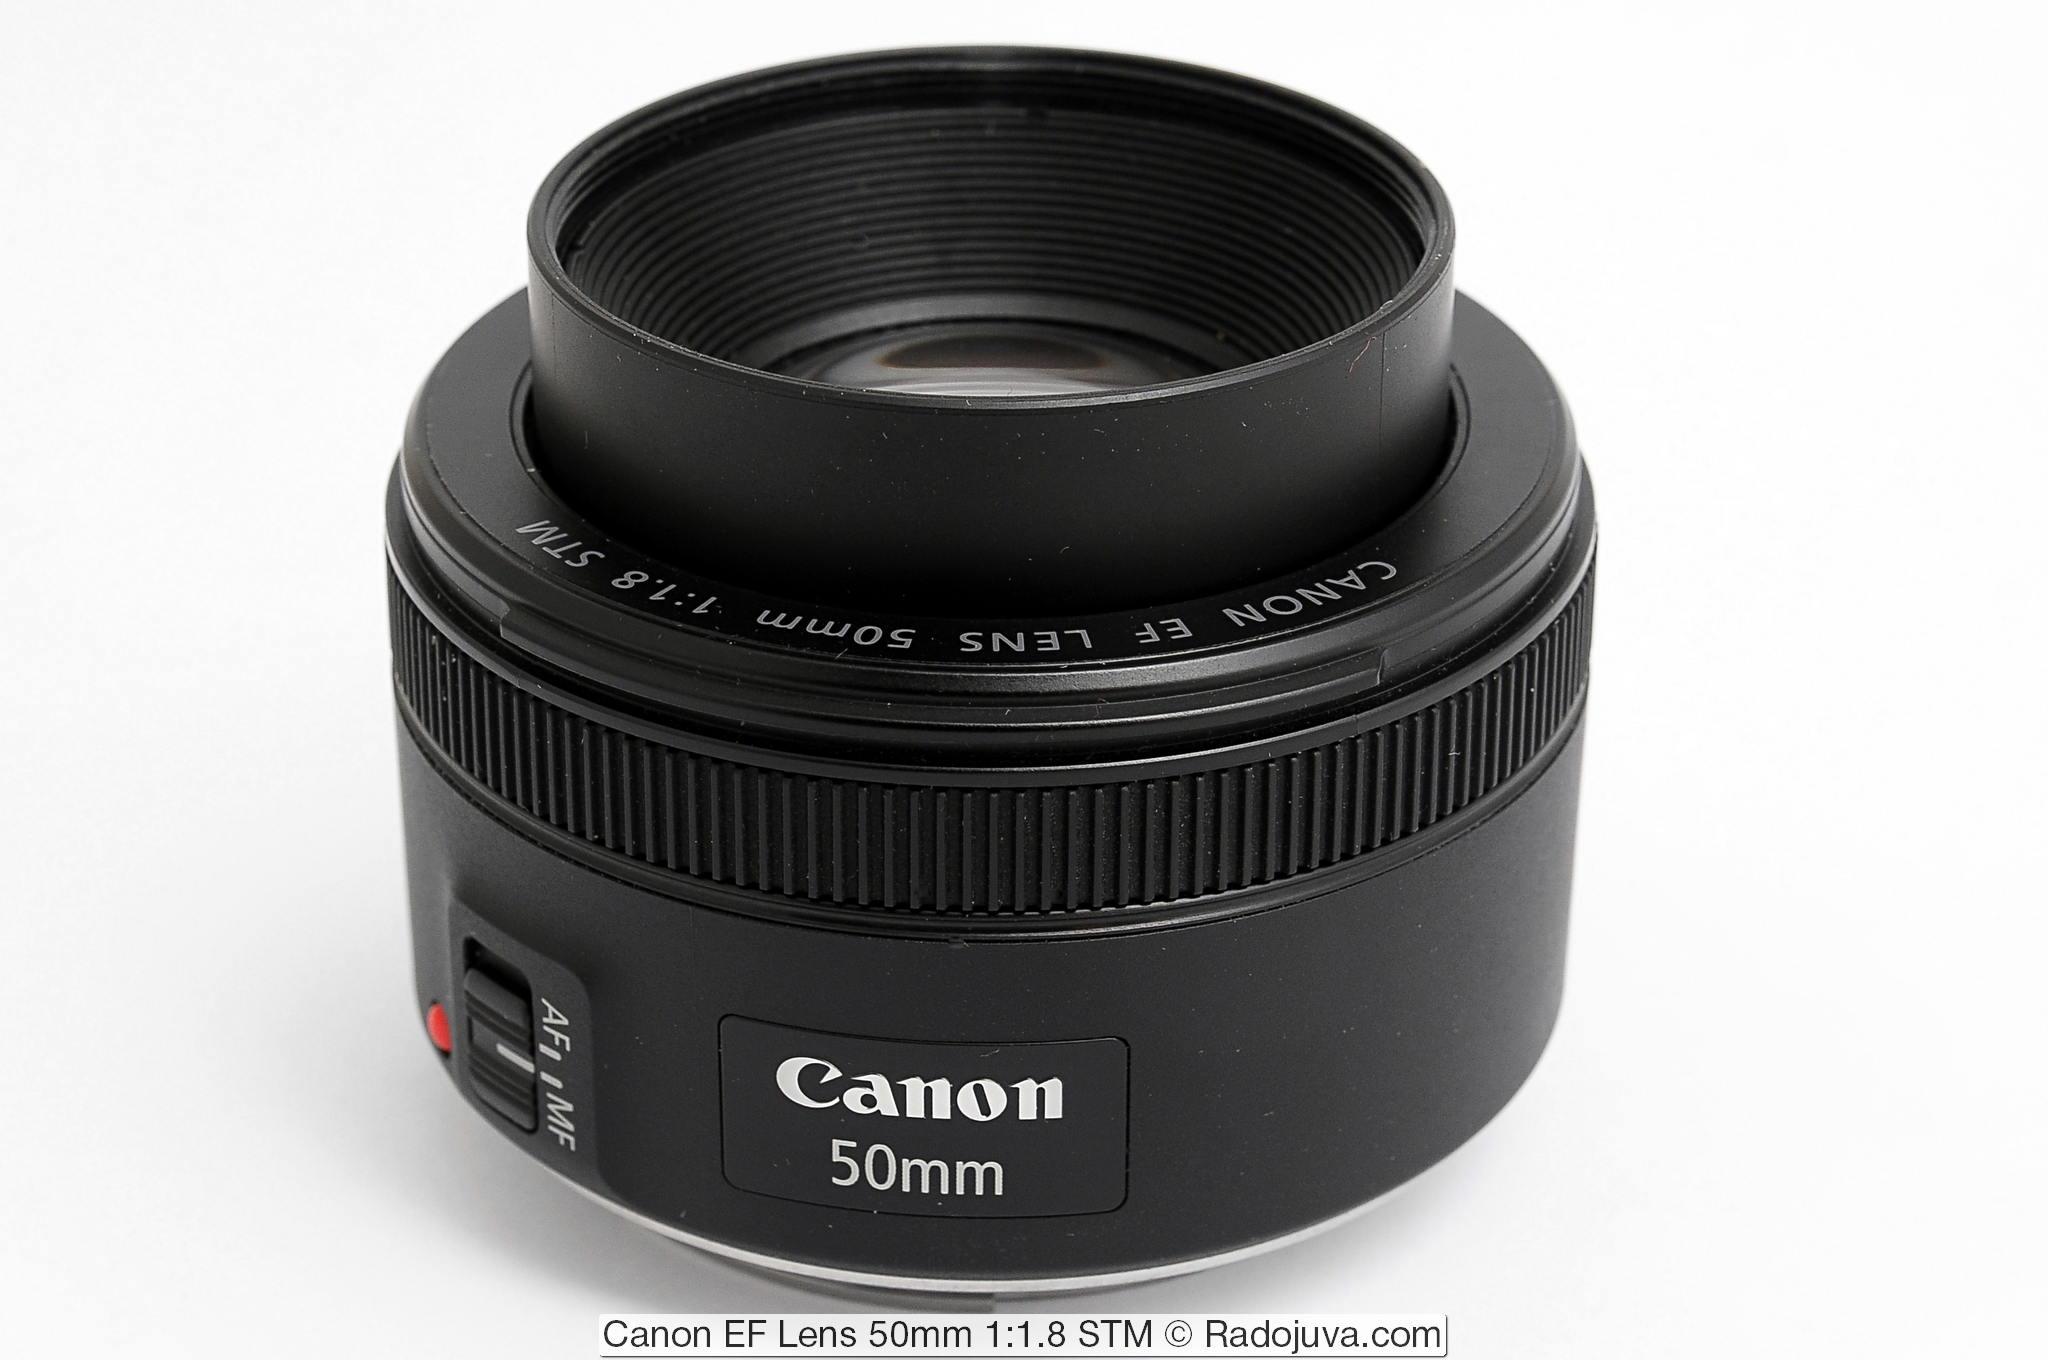 Canon EF Lens 50mm 1:1.8 STM